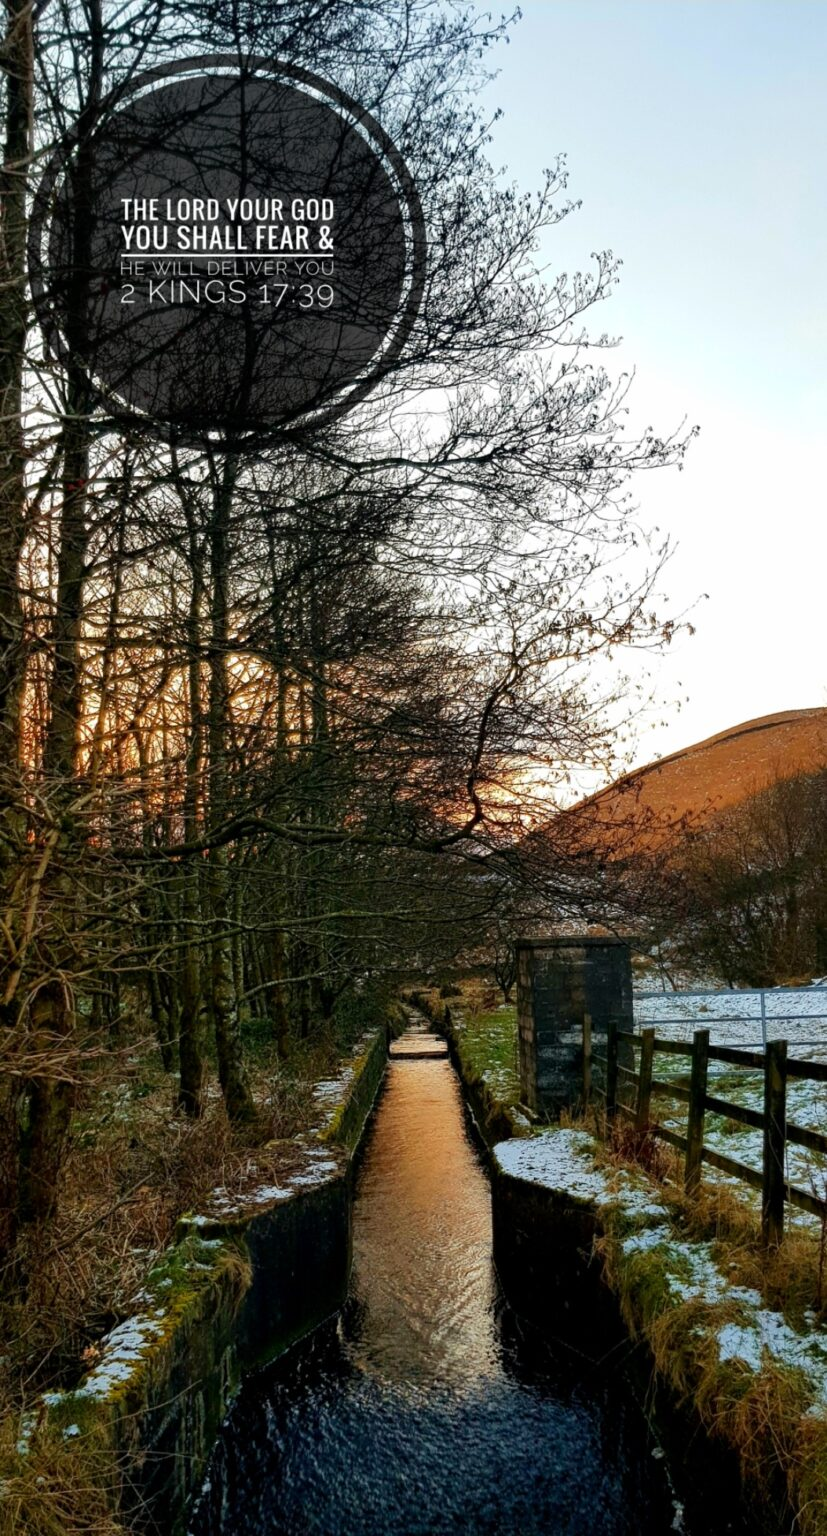 Chelburn reservoir - Psalm 25 part 2